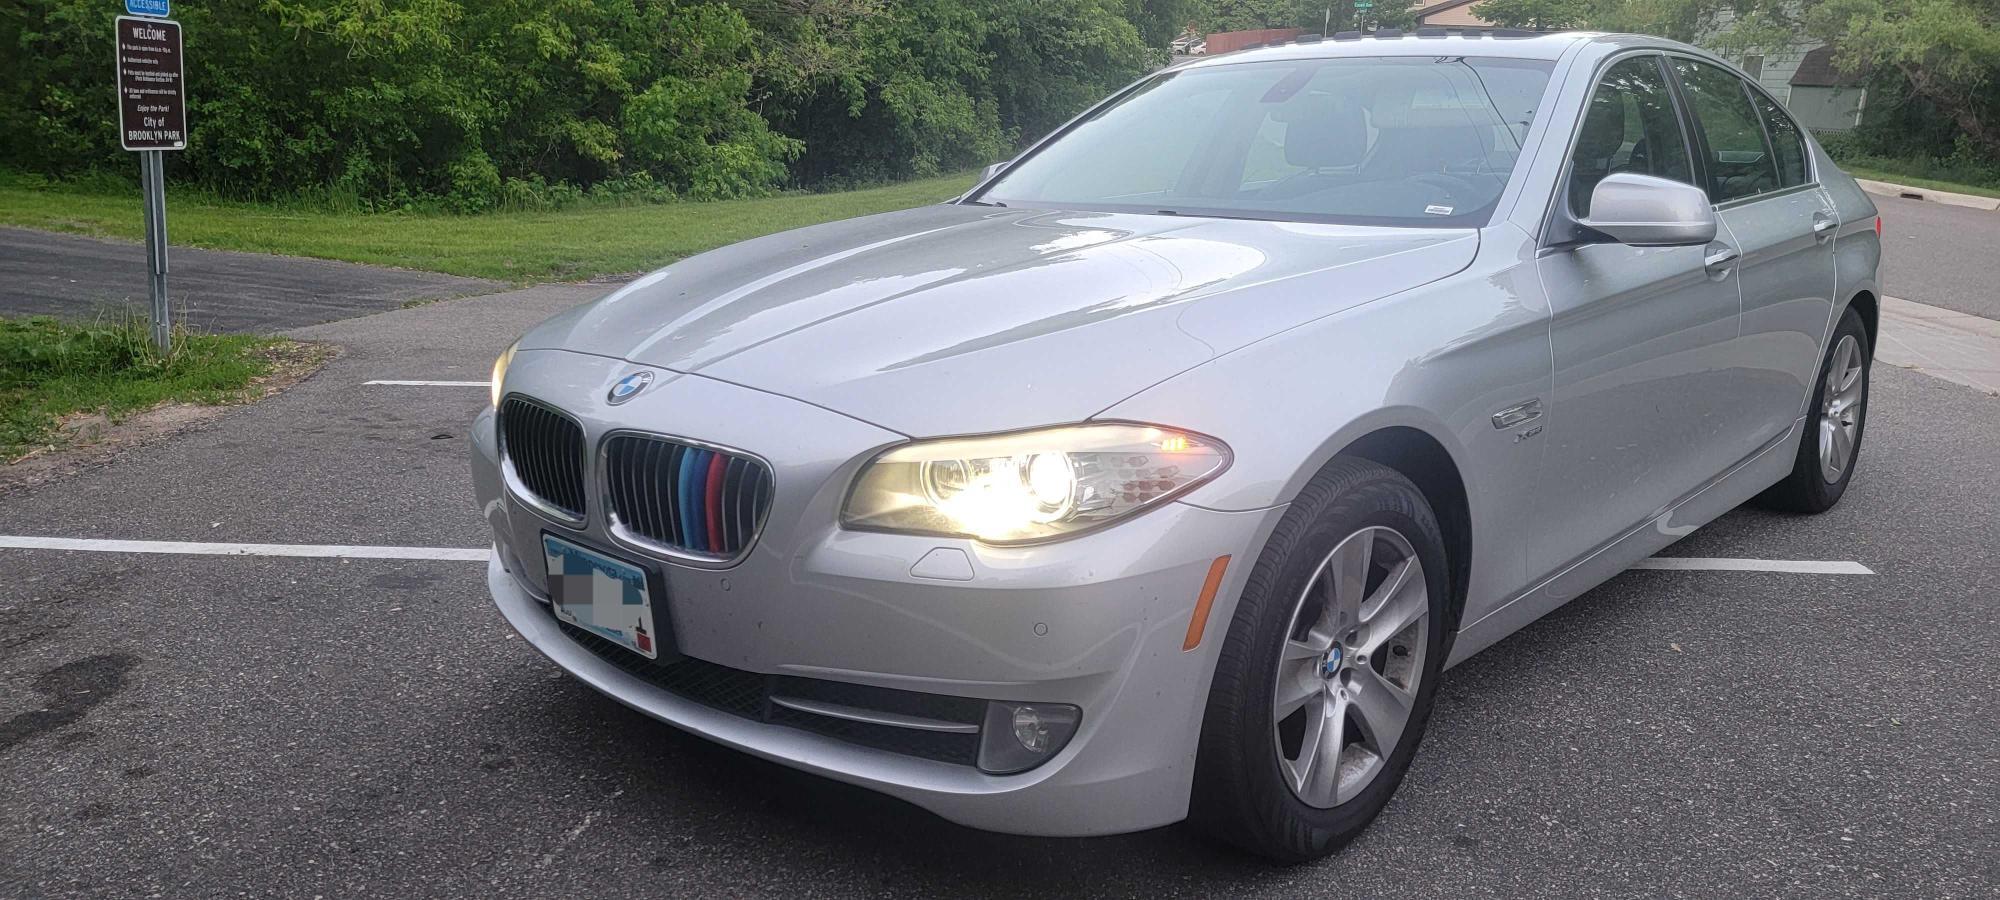 BMW 5 SERIES 2012 1